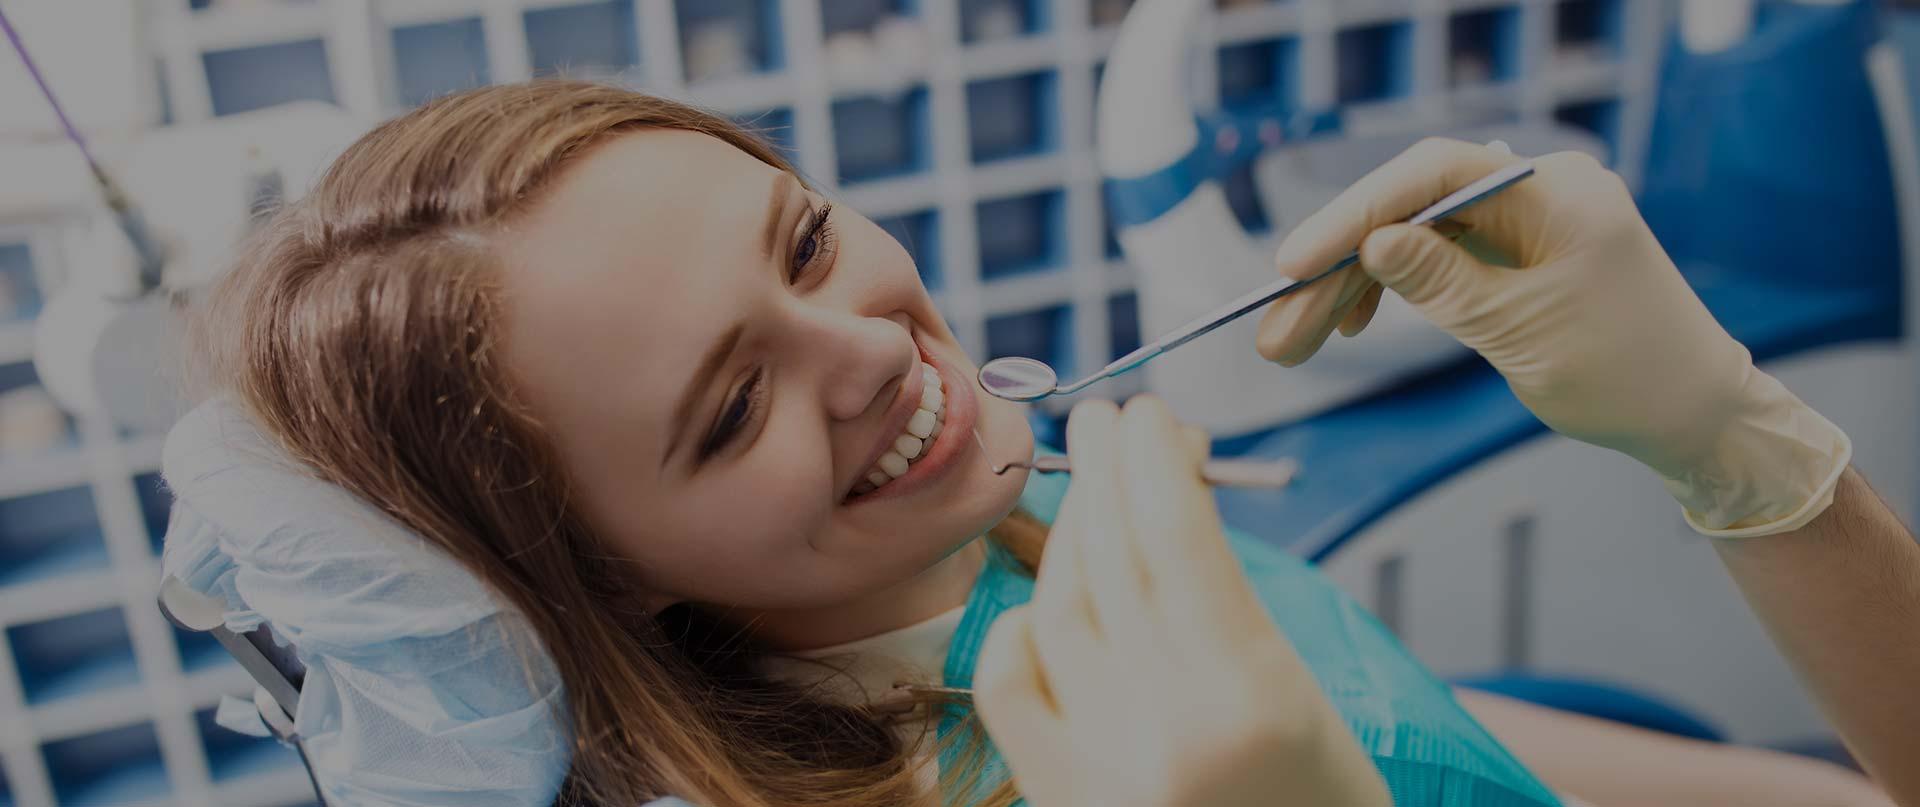 Orthodontics in Chandigarh